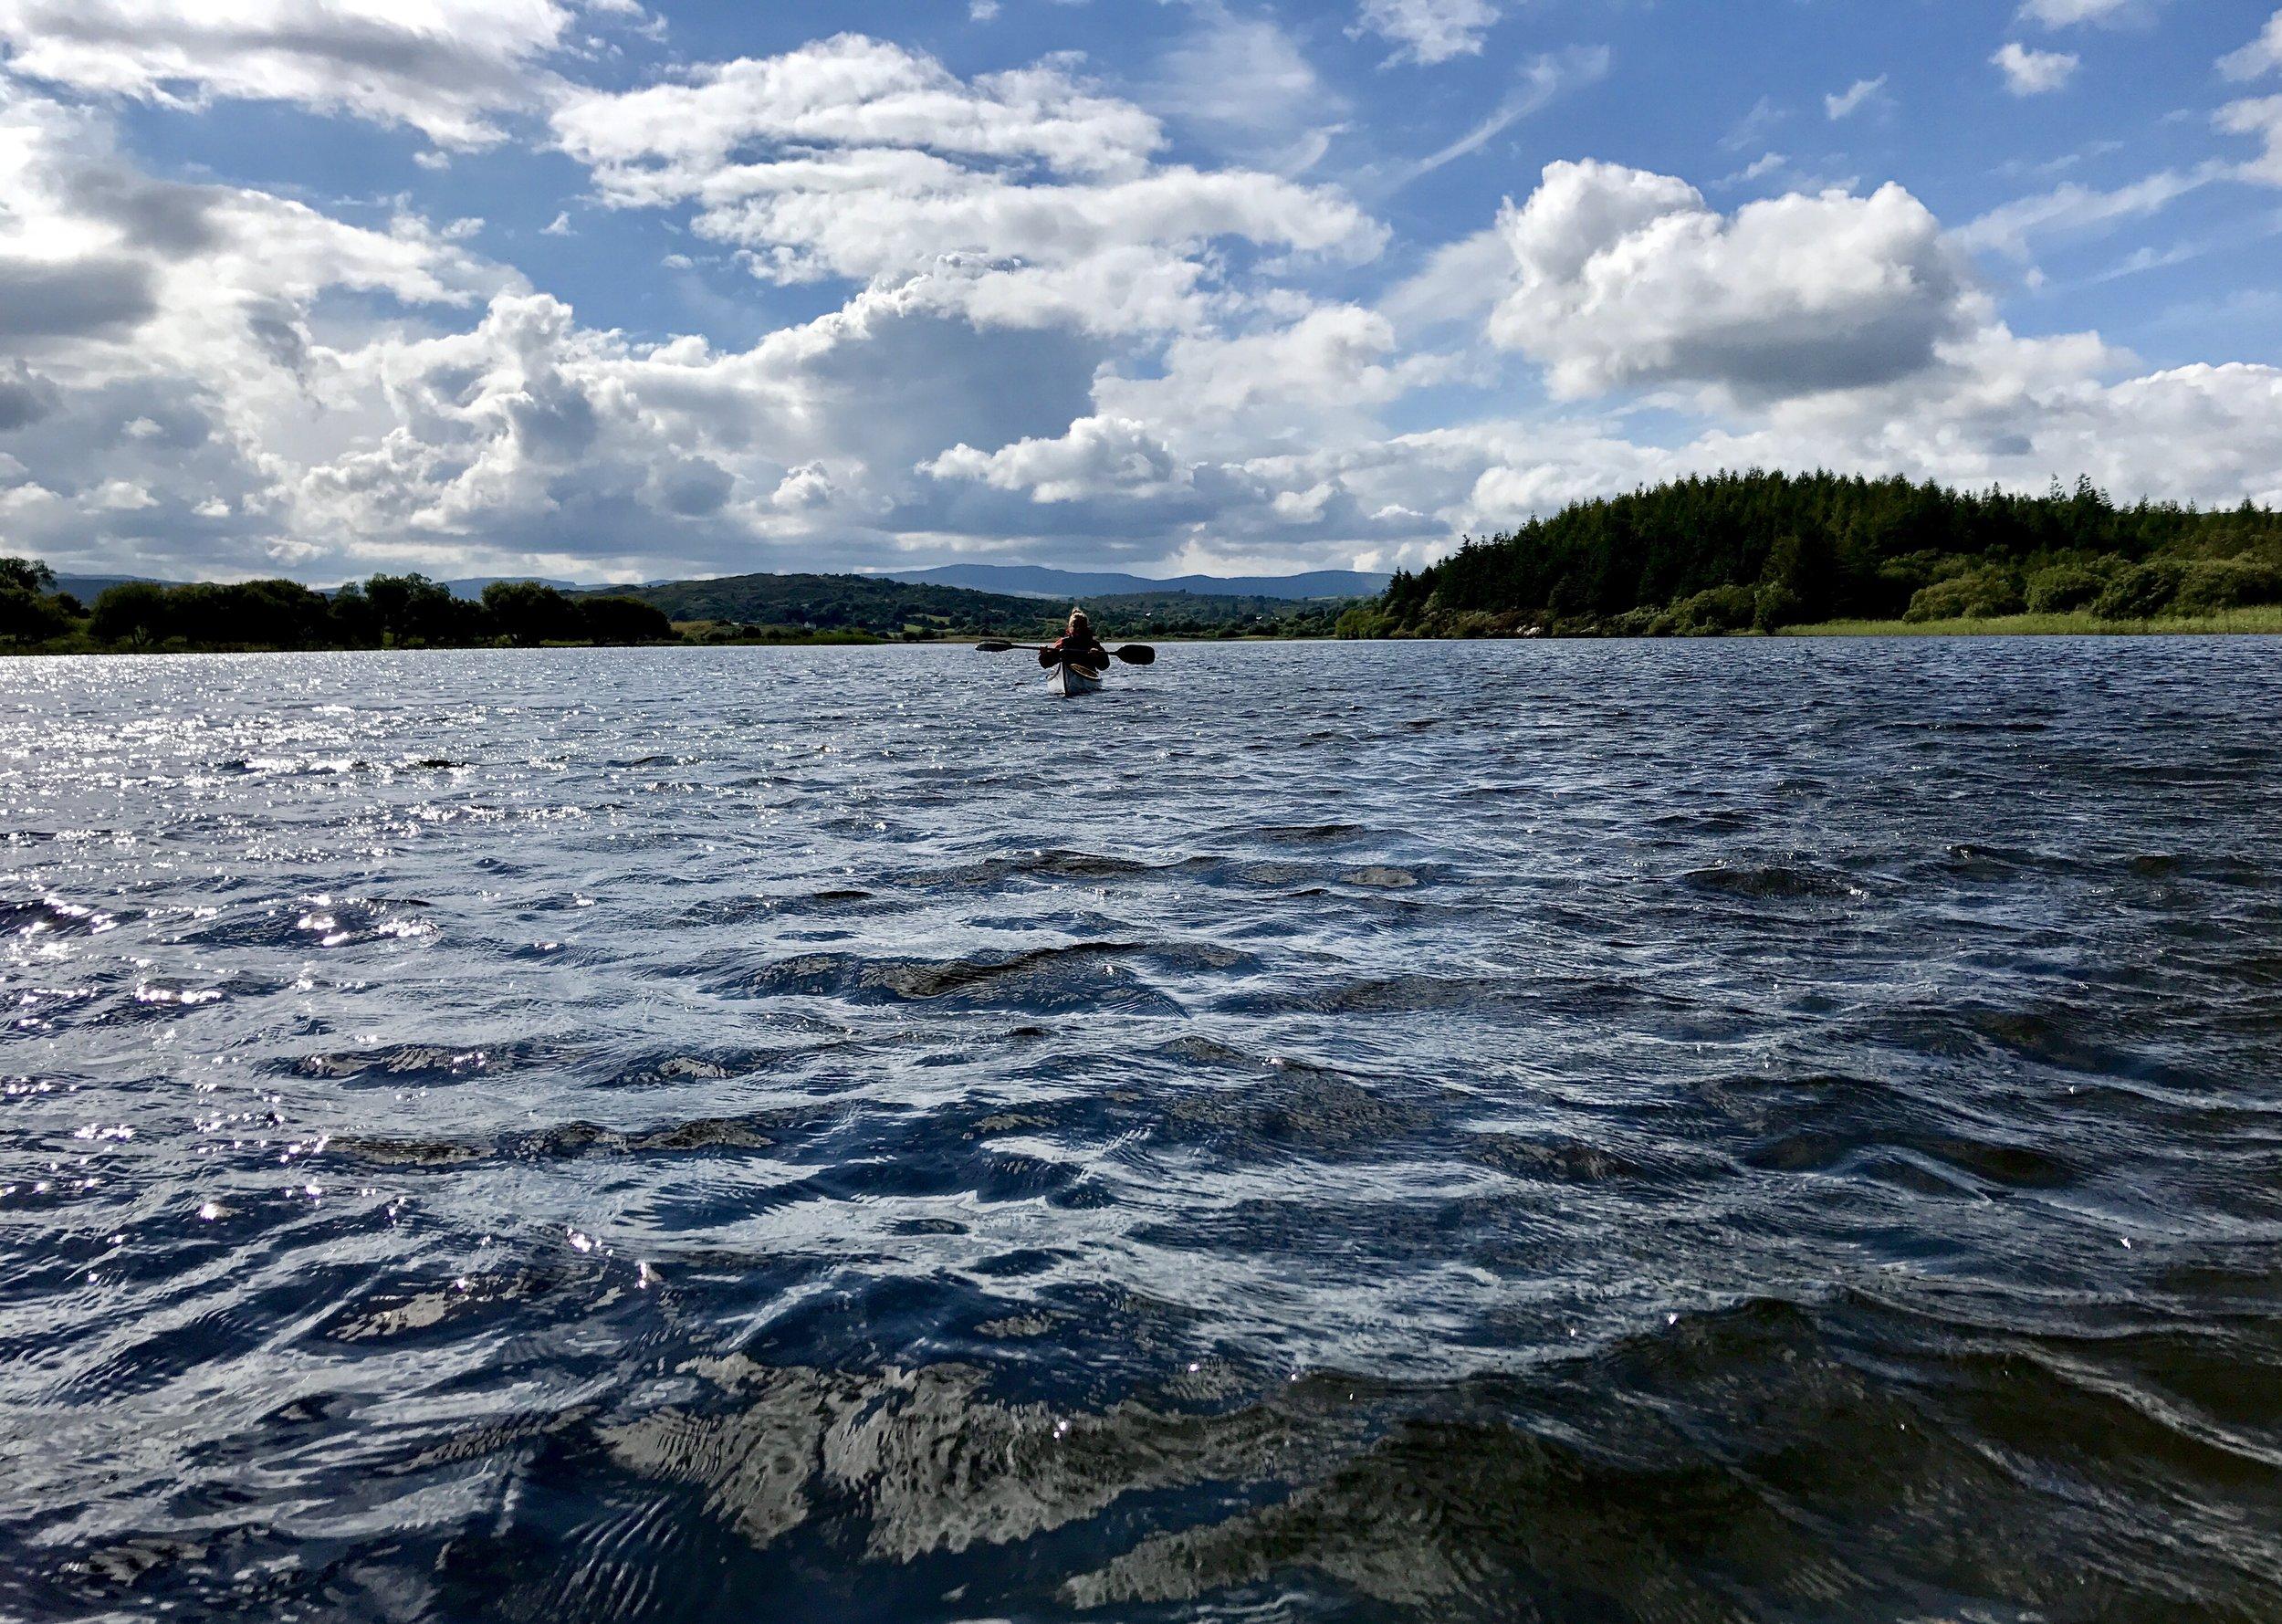 Lough Allua Kayaker.jpg